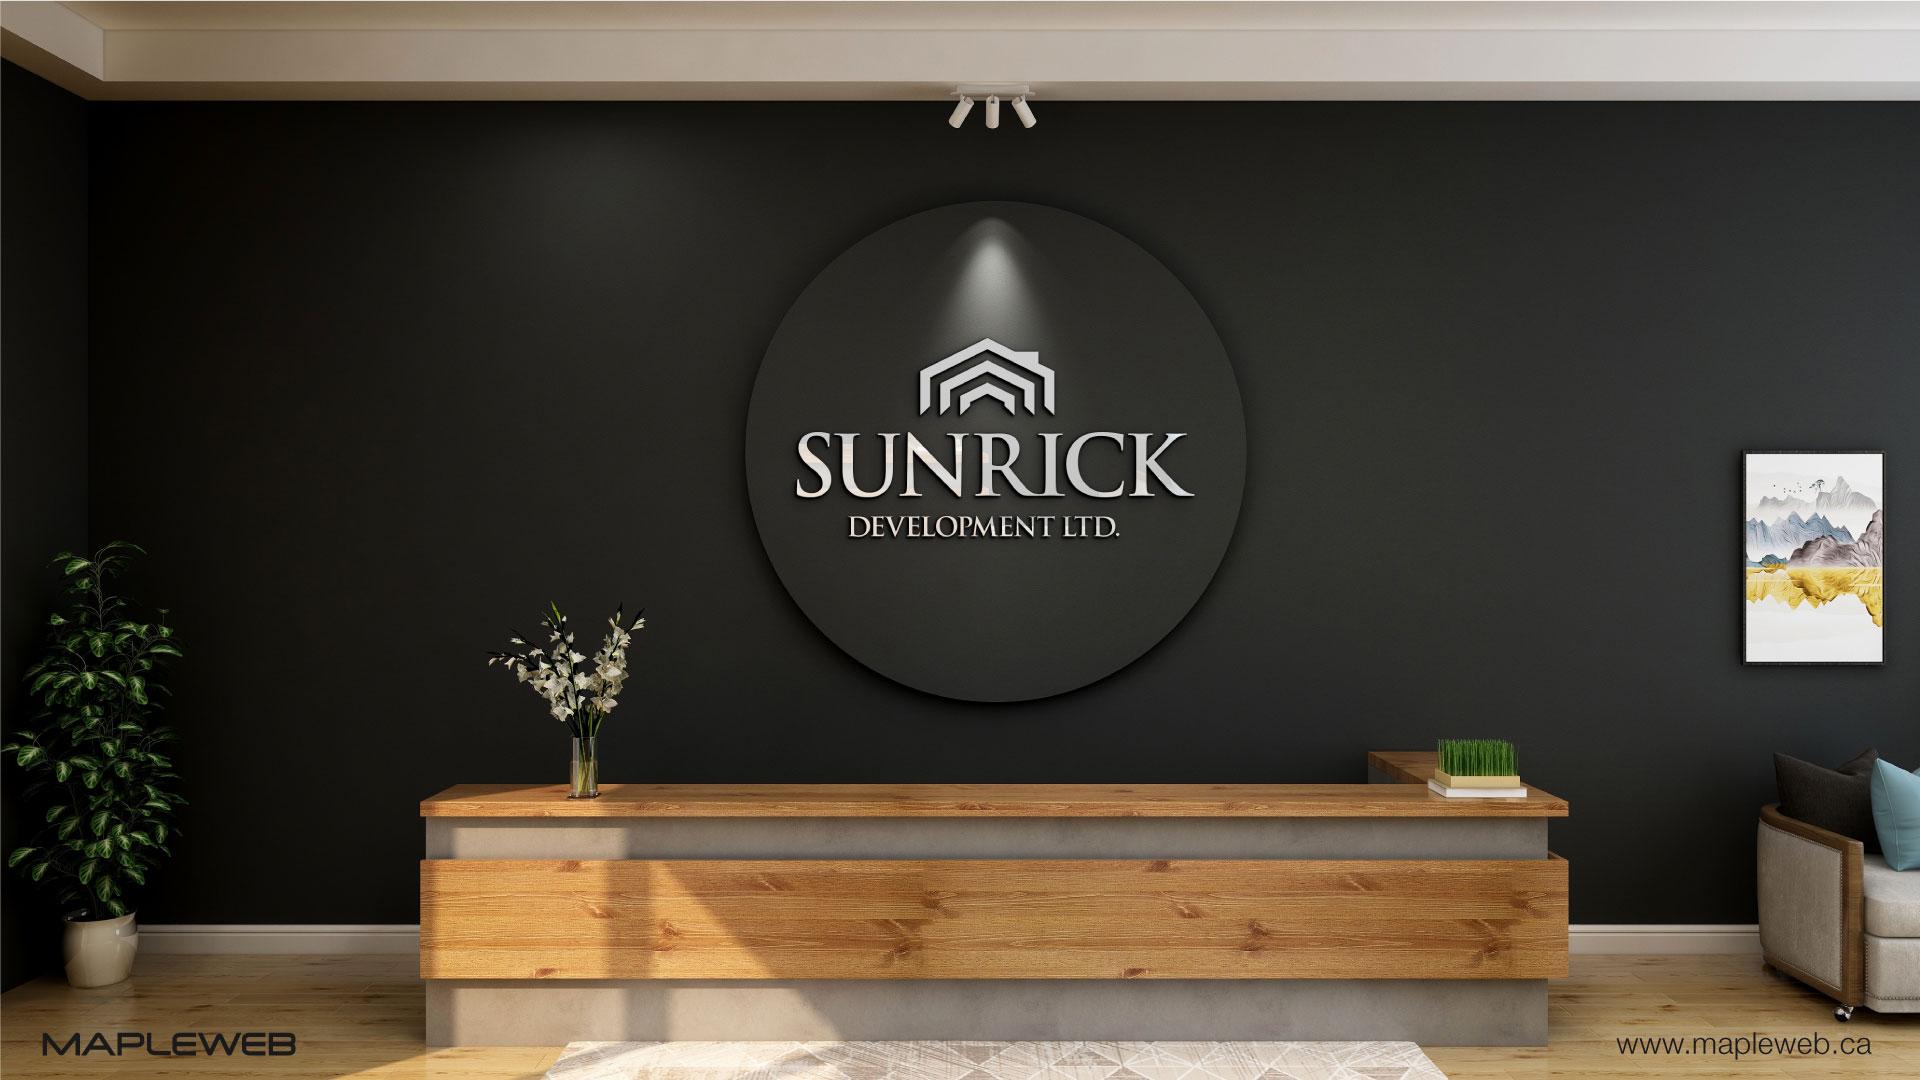 sunrick-development-ltd-brand-logo-design-by-mapleweb-vancouver-canada-reception-wall-mock